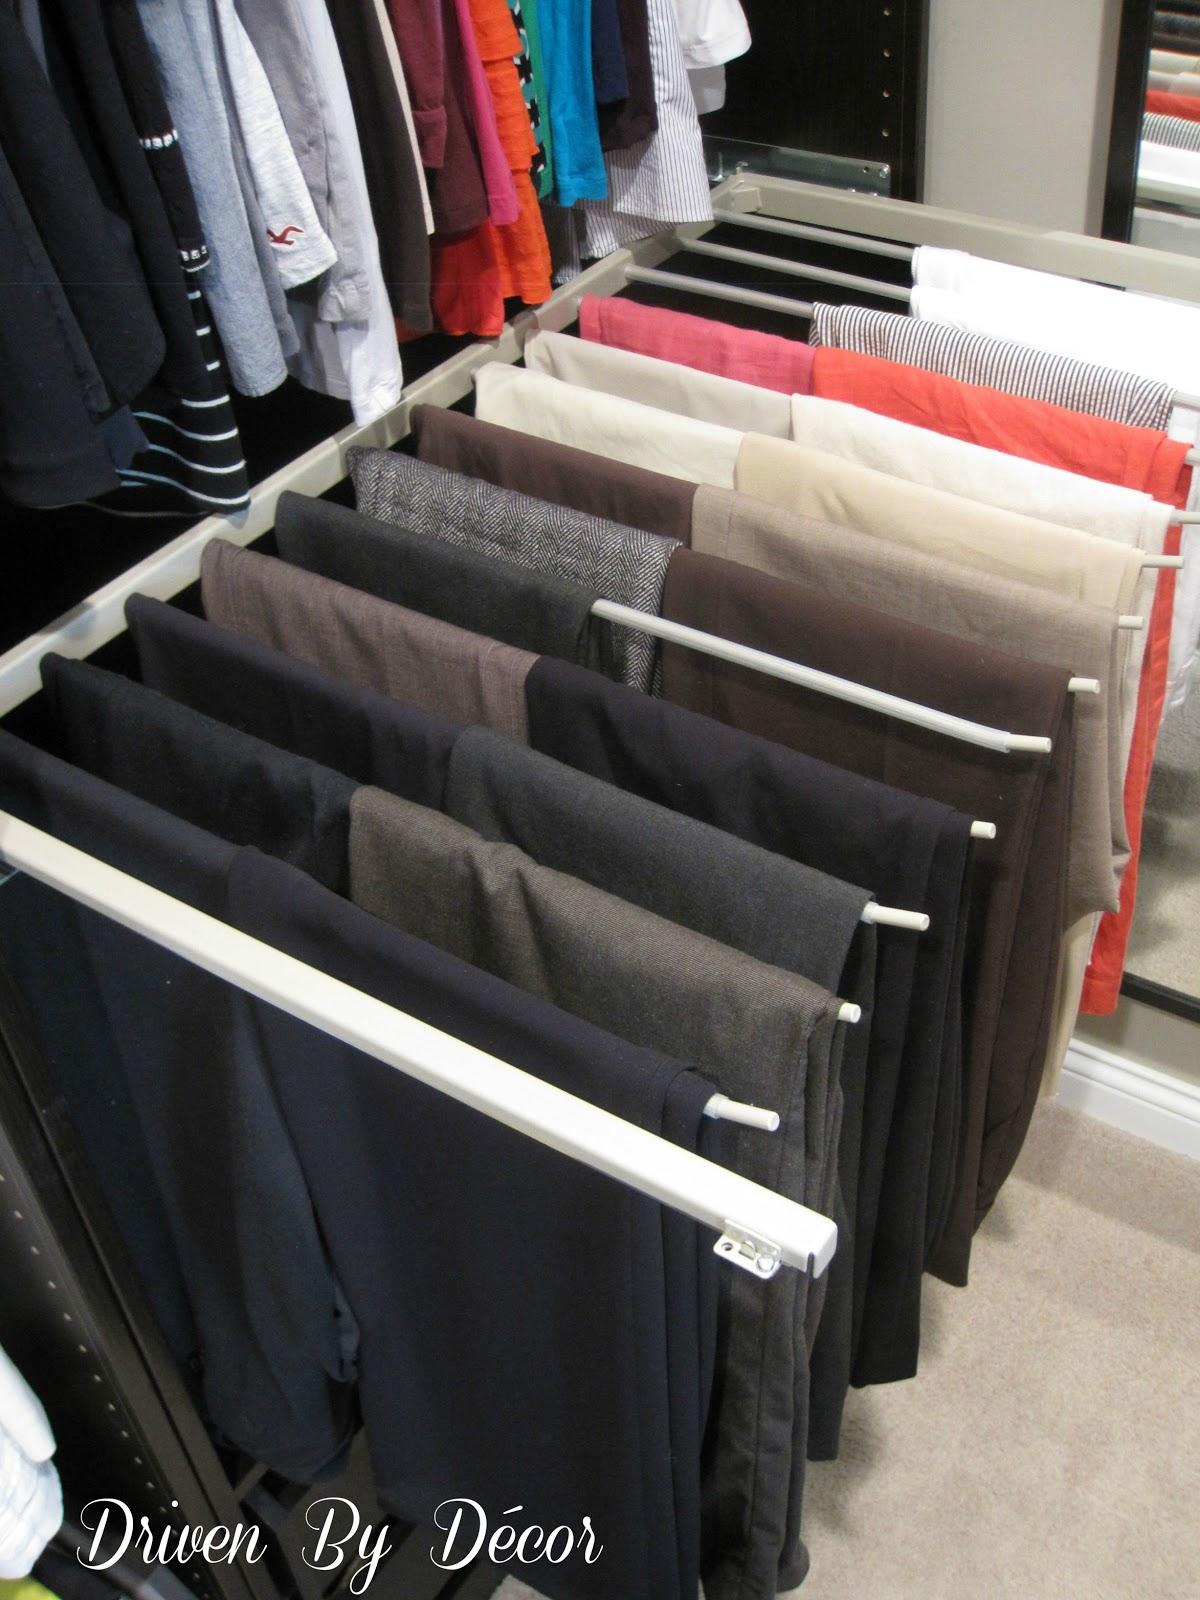 Elvarli Ikea Ikea Pax Komplement 1x Shoe Organiser And 2x Trouser